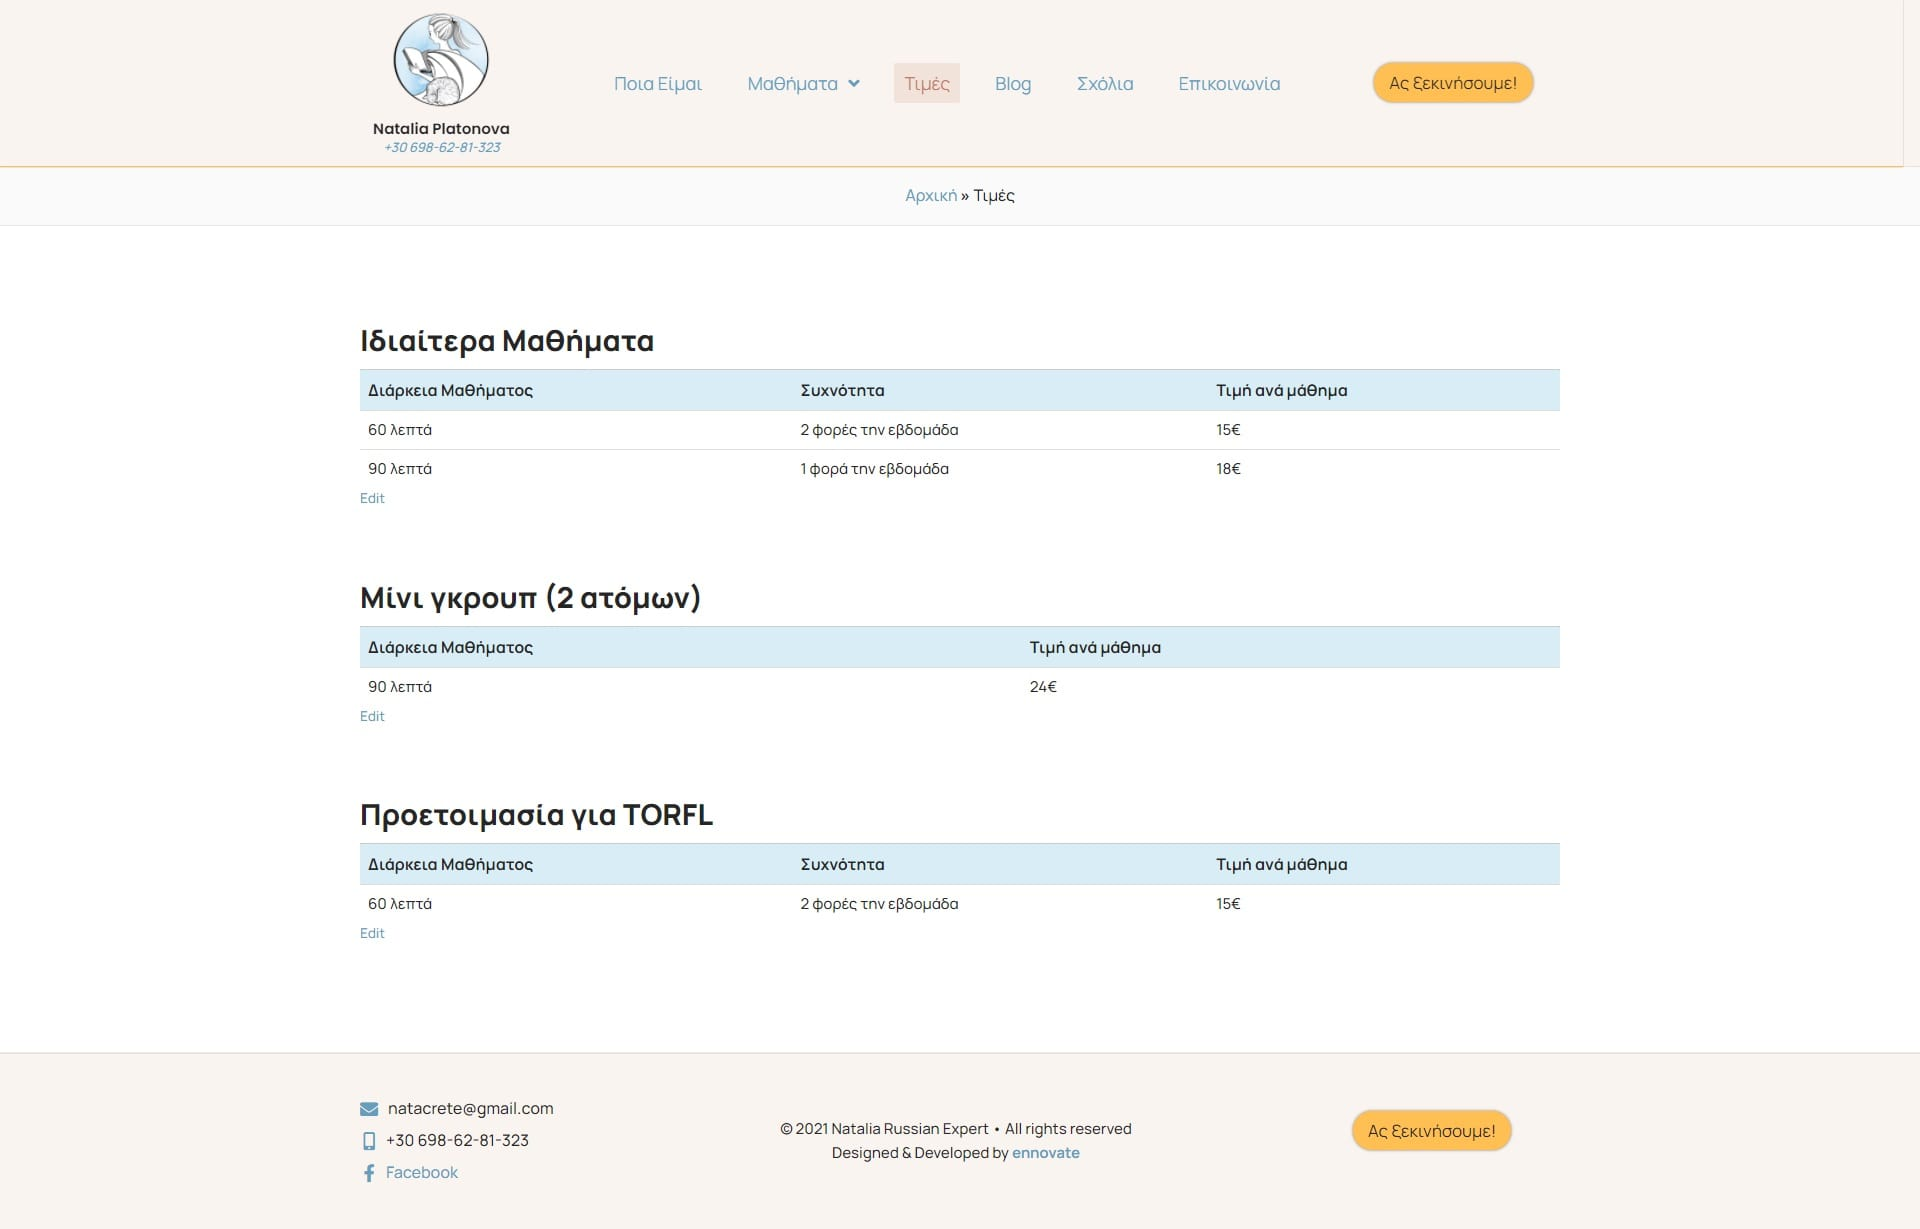 NATALIA RUSSIAN EXPERT - PRICELIST PAGE